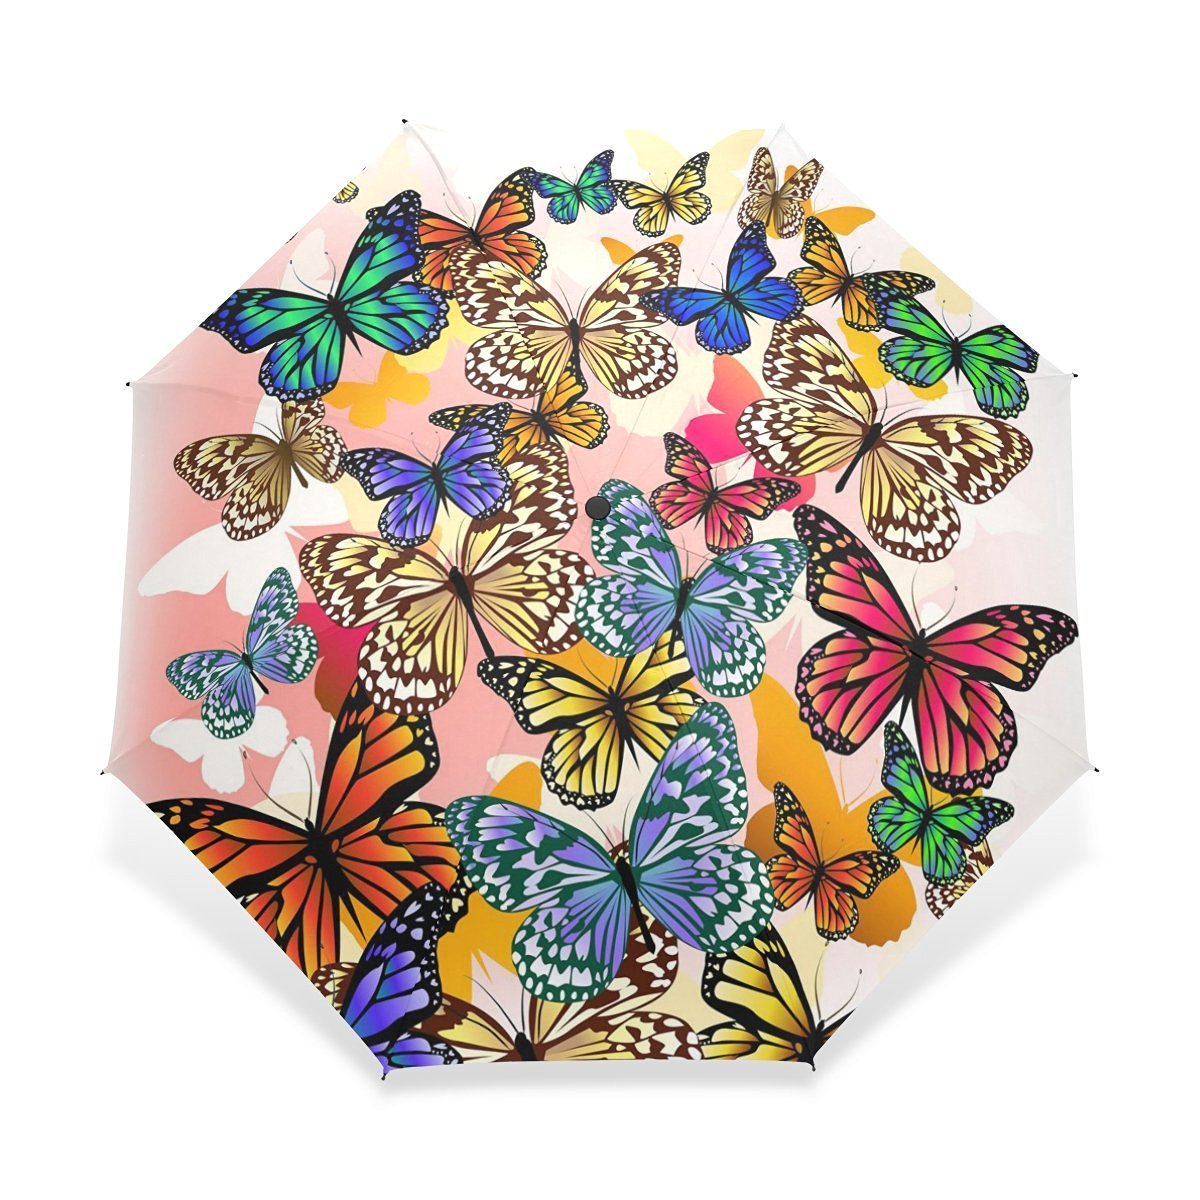 094078958 Get Quotations · ZOEO Rain Folding Umbrella Windproof,Colorful Cartoon  Butterfly,Foldable Compact Travel Umbrella